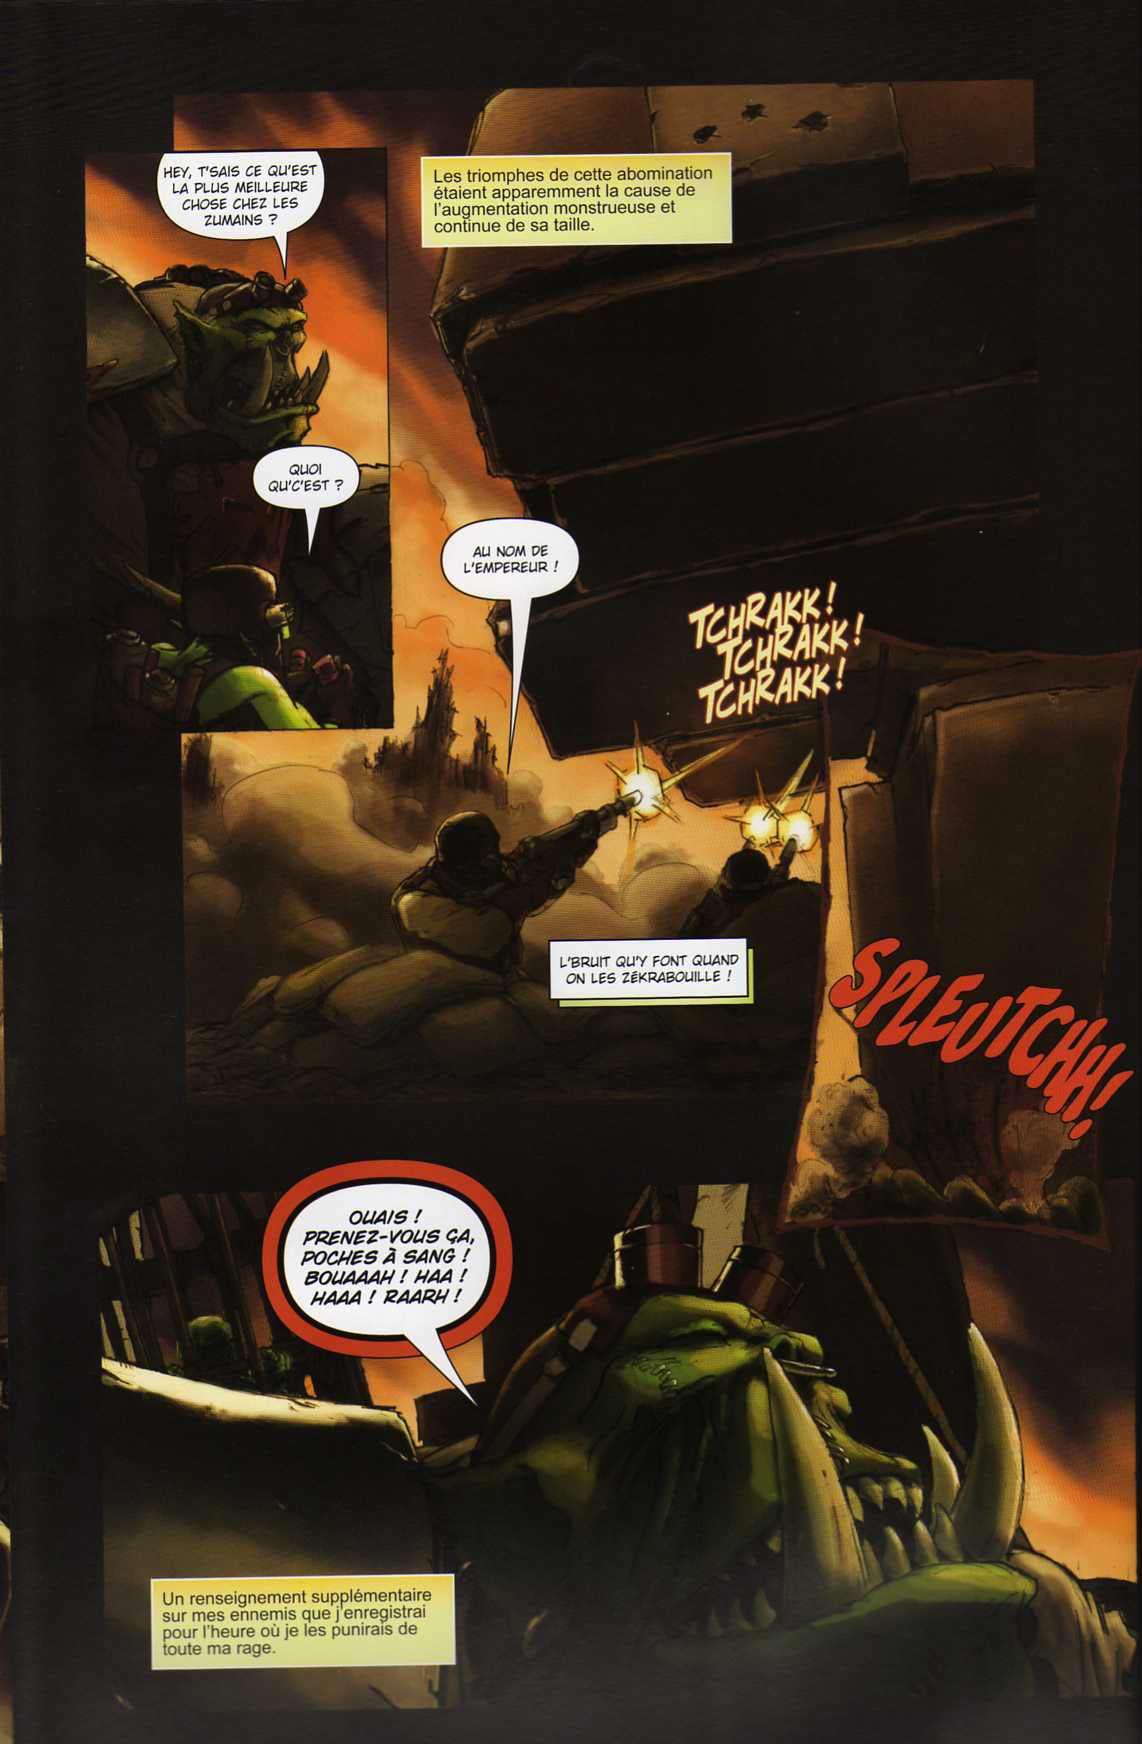 T4 : Le clan des Orks - Warhammer 40.000 (page 4)